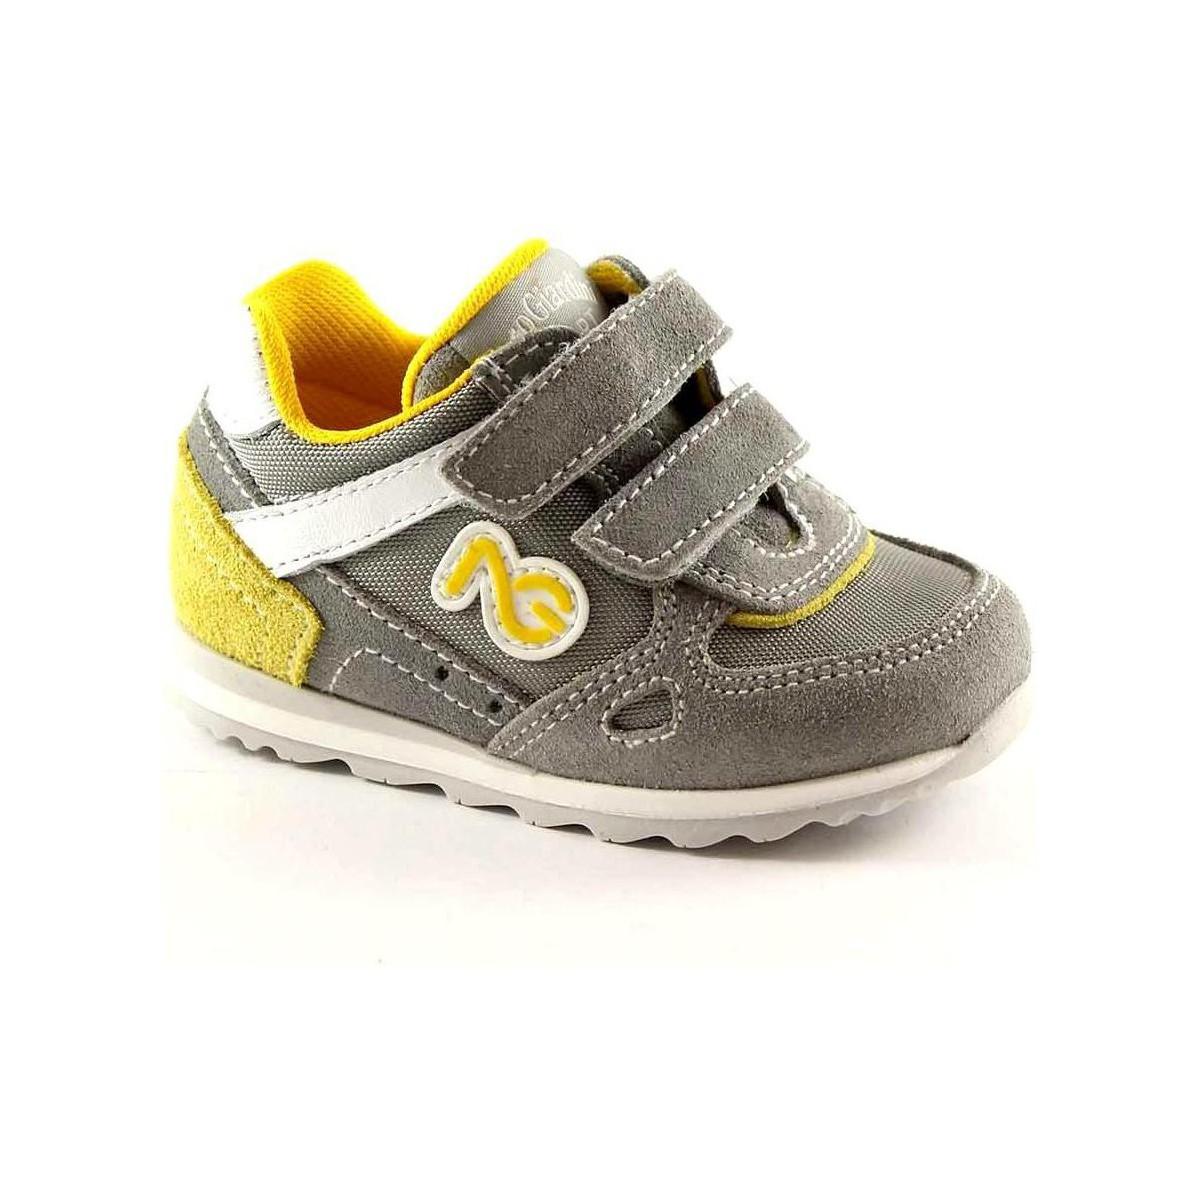 Nero giardini junior 23482 grigia scarpe bambino sneaker - Scarpe nero giardini bambino ...